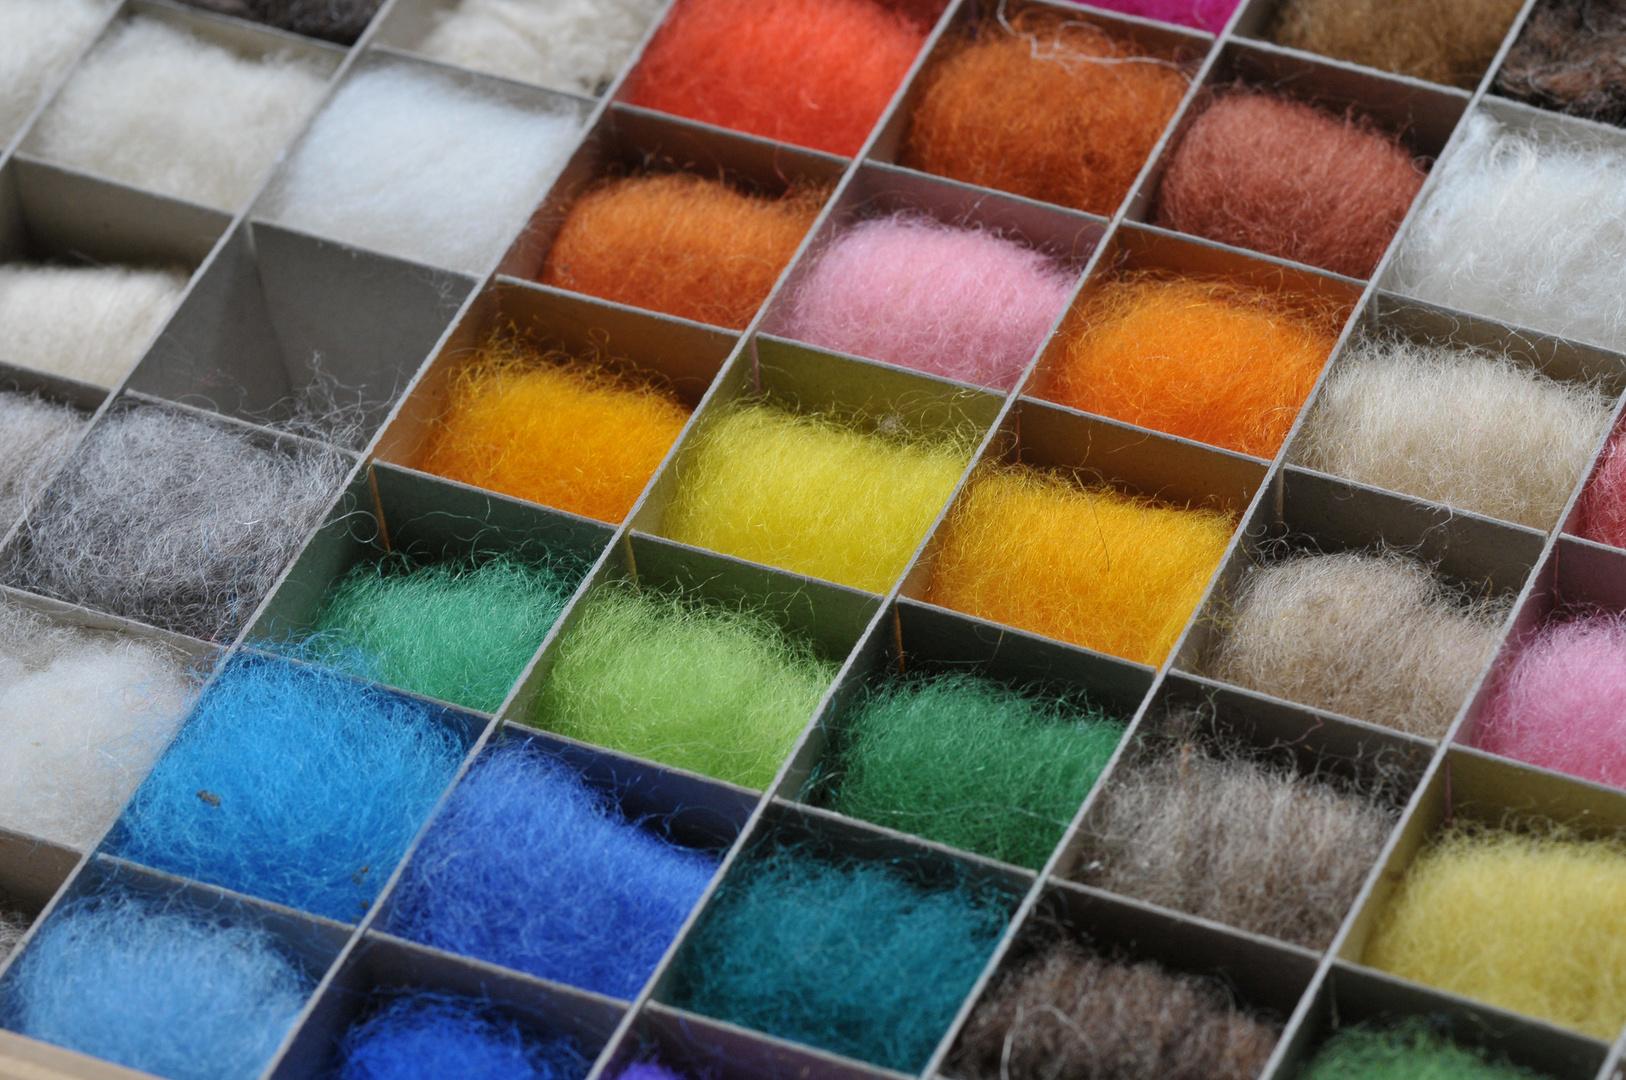 Viele Bunte Farben